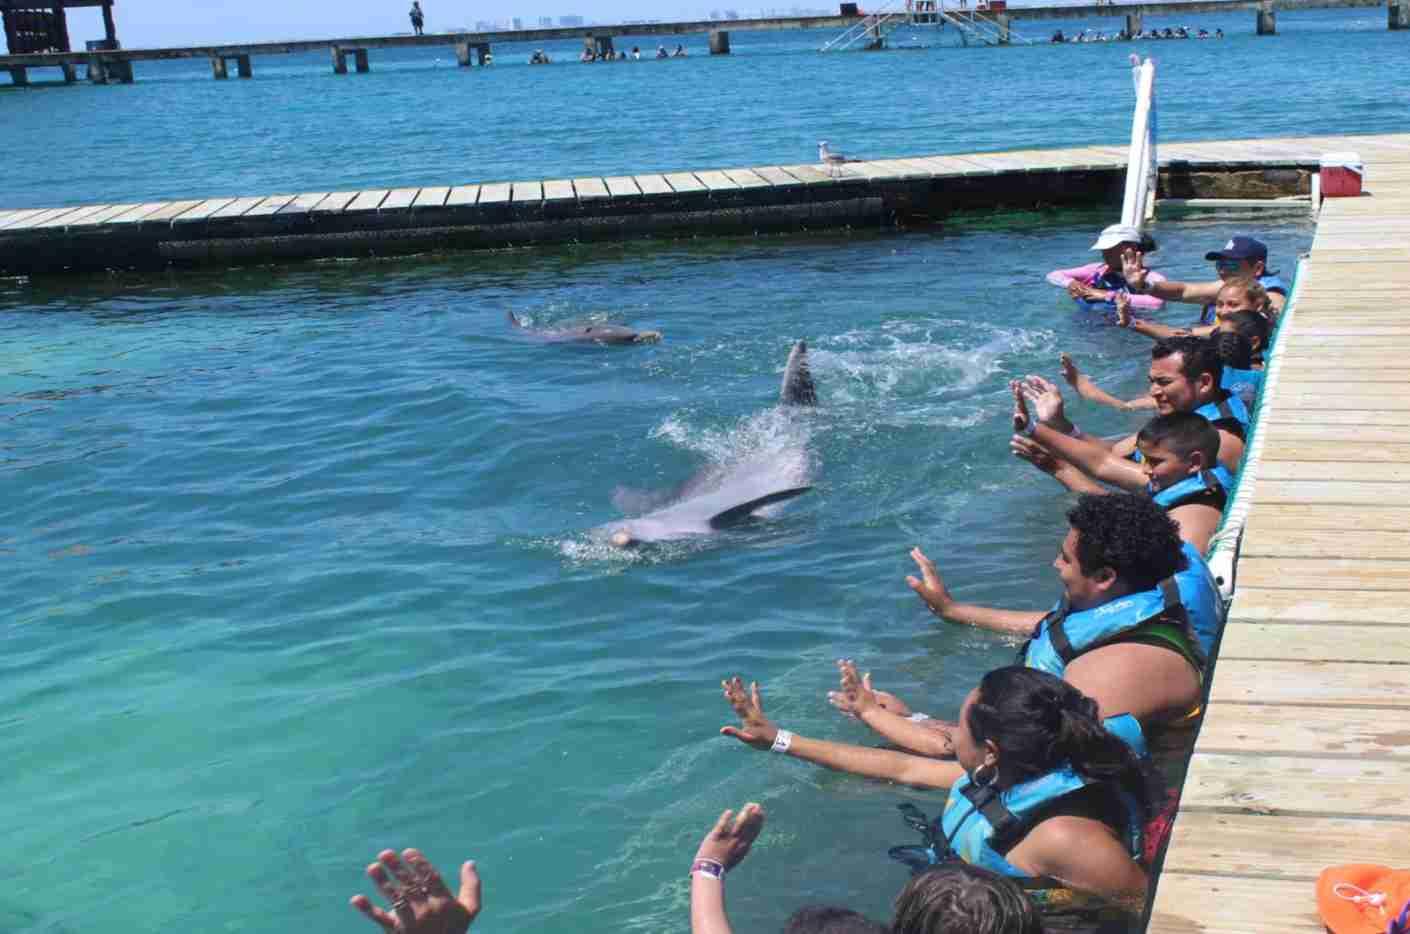 (Photo courtesy of Dolphin Discovery)